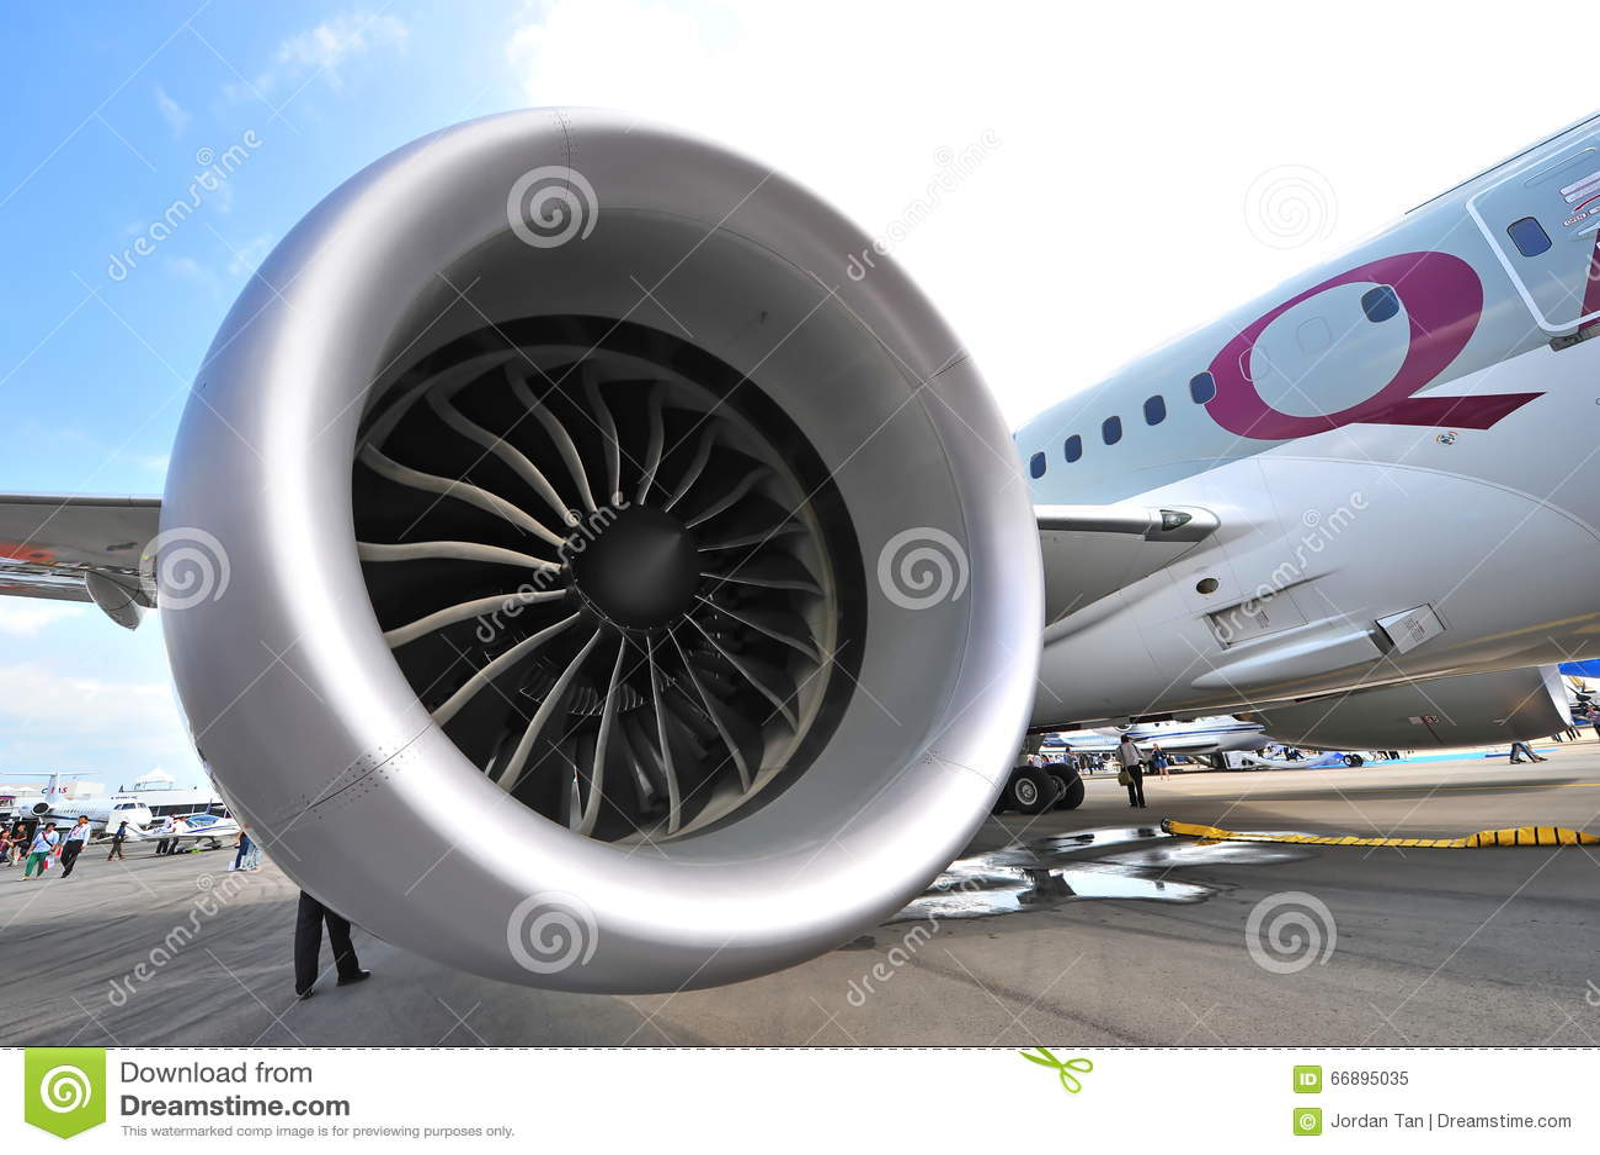 General Electric GEnx engine powering the Qatar Airways Boeing 787-8 Dreamliner at Singapore Airshow